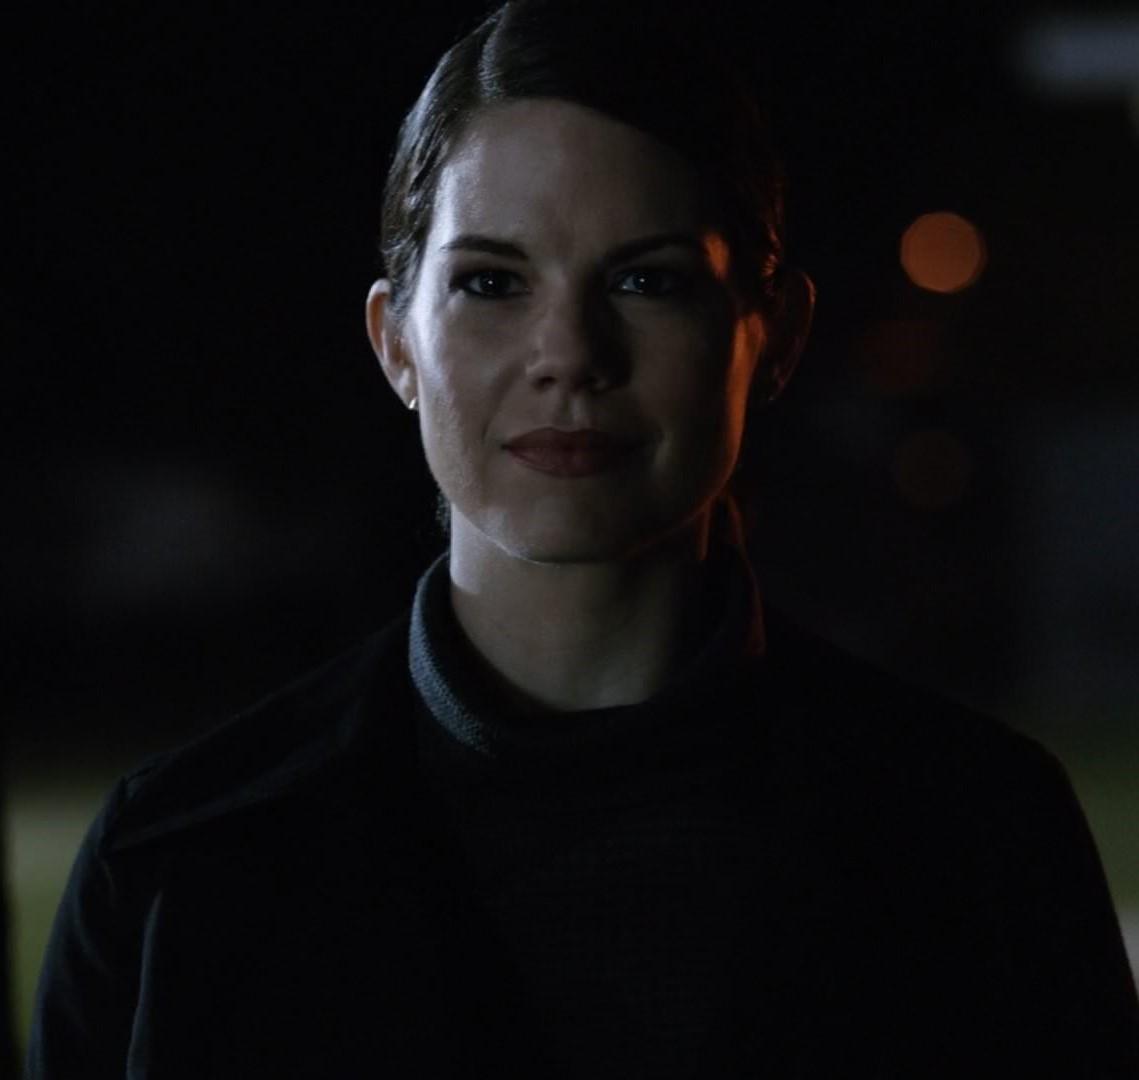 Brooke Mathison (Designated Survivor)